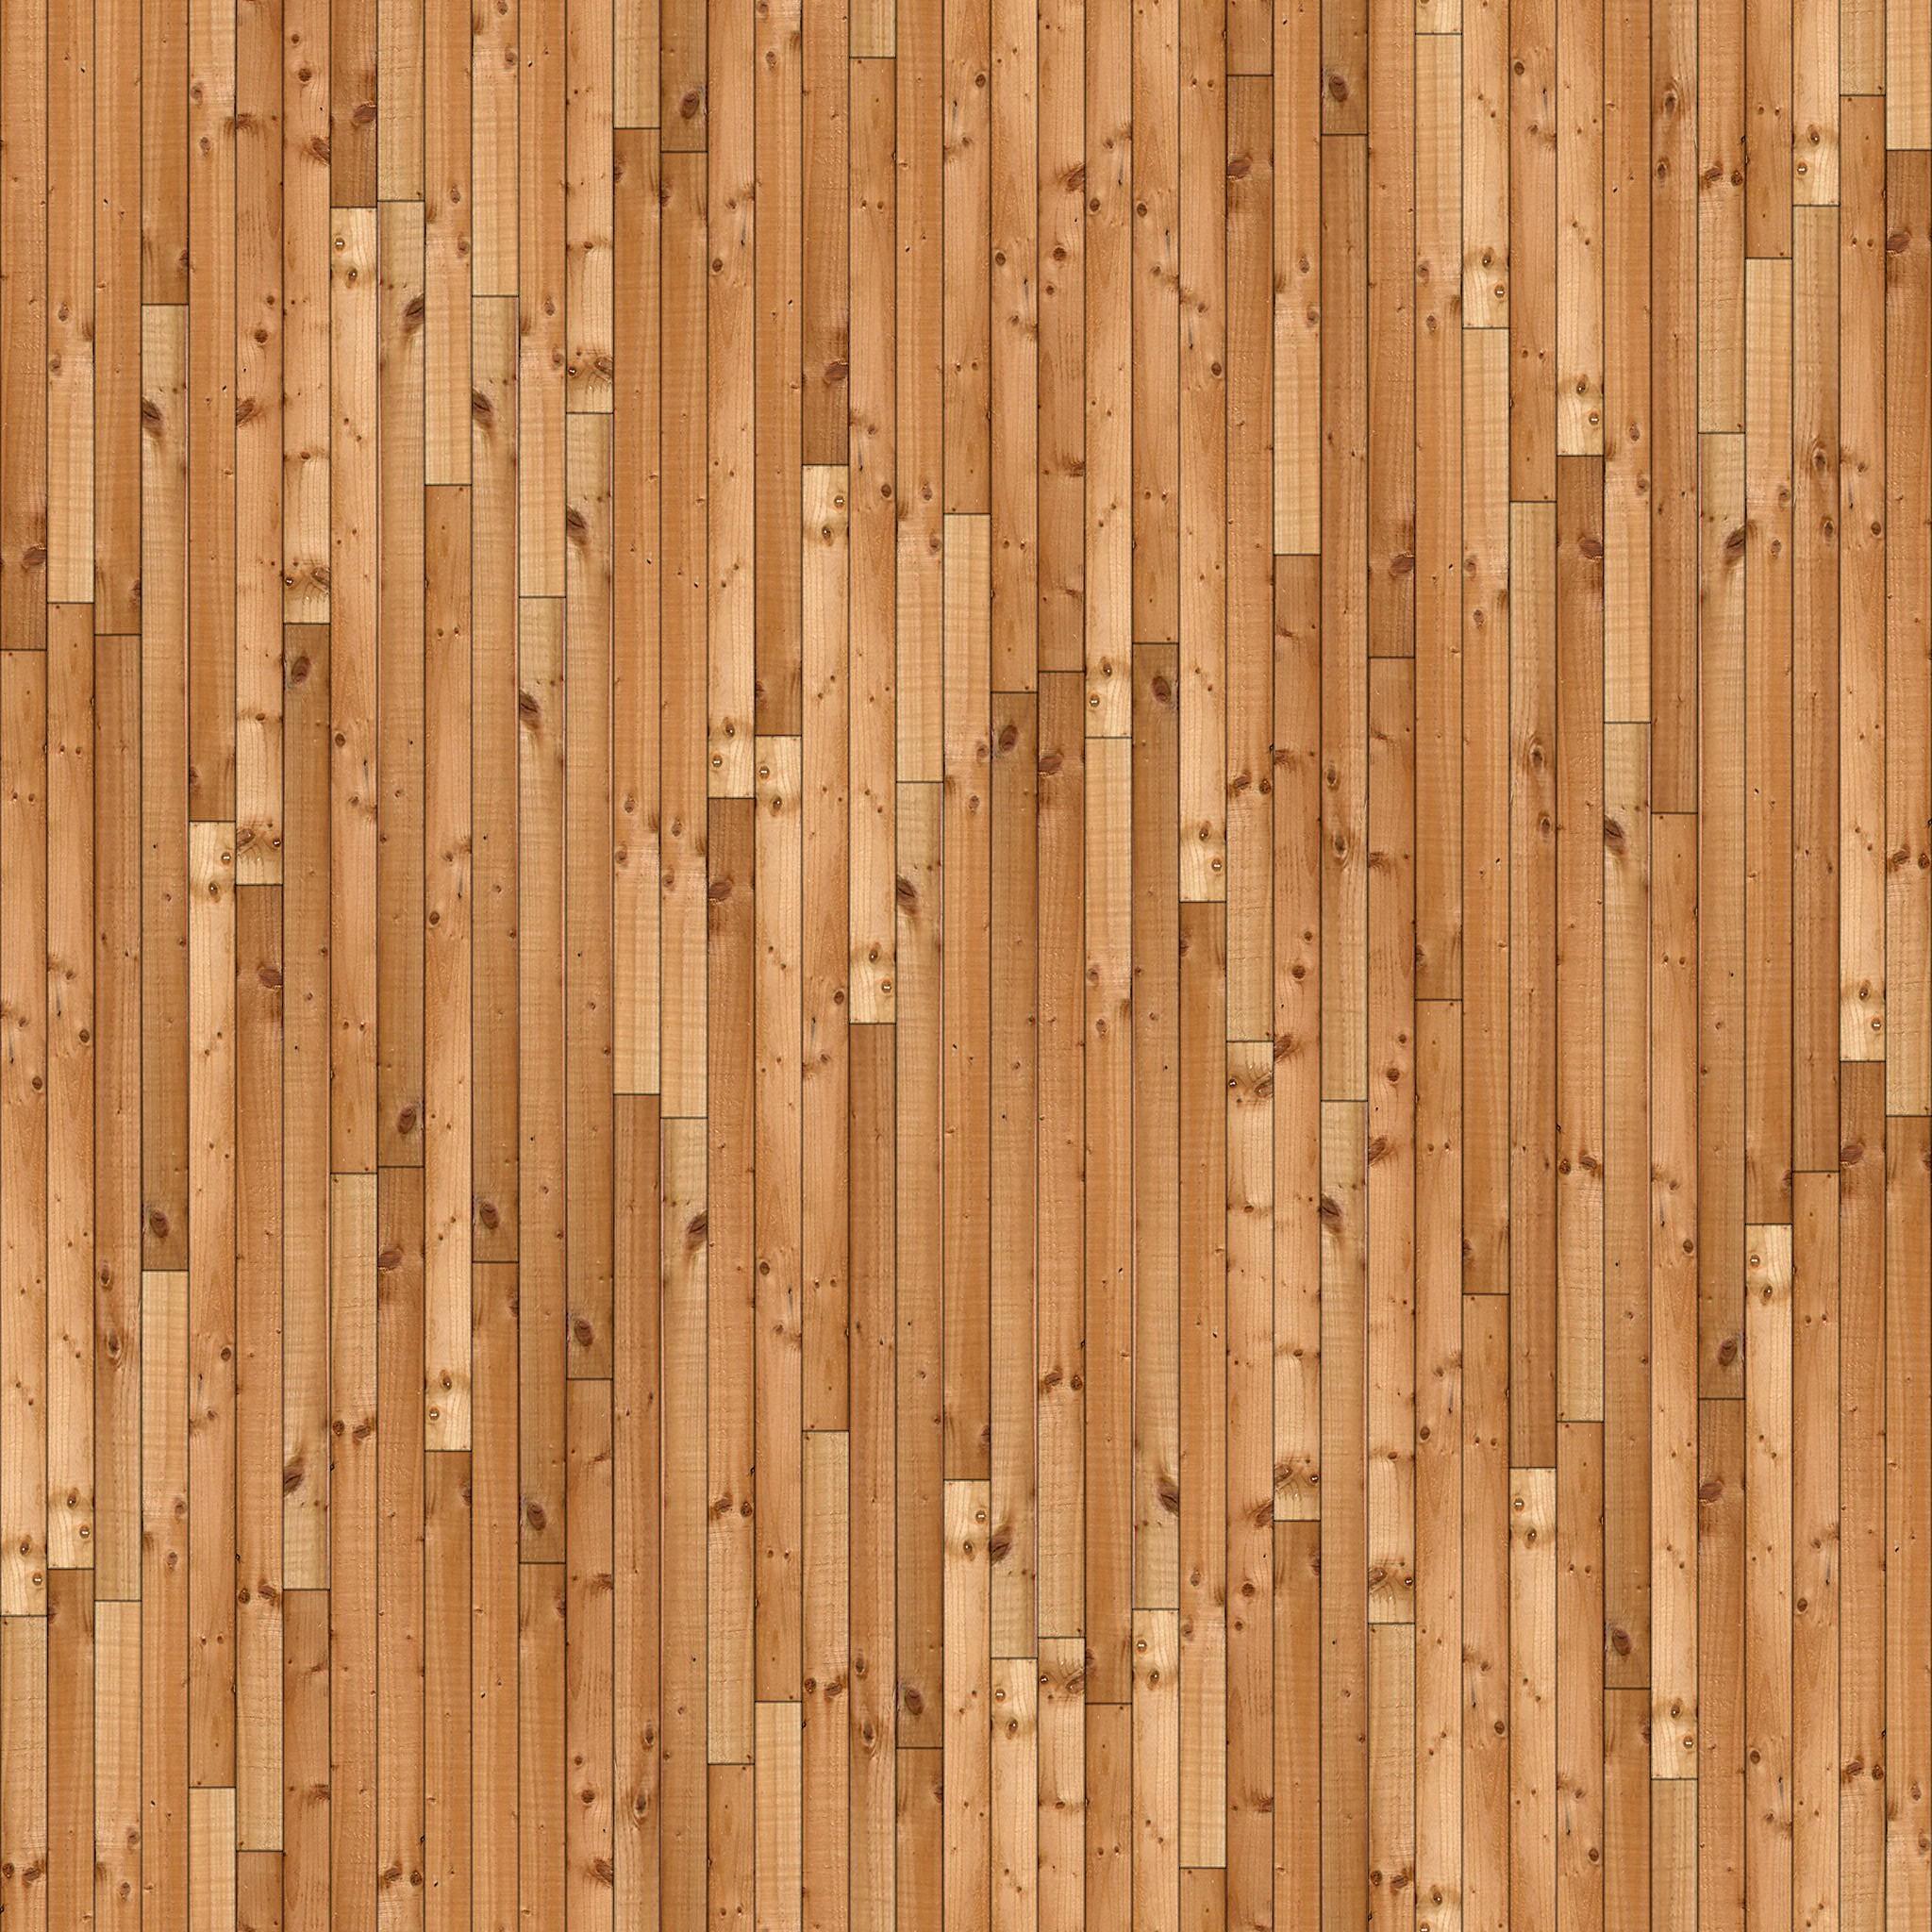 disney ipad wallpaper hd